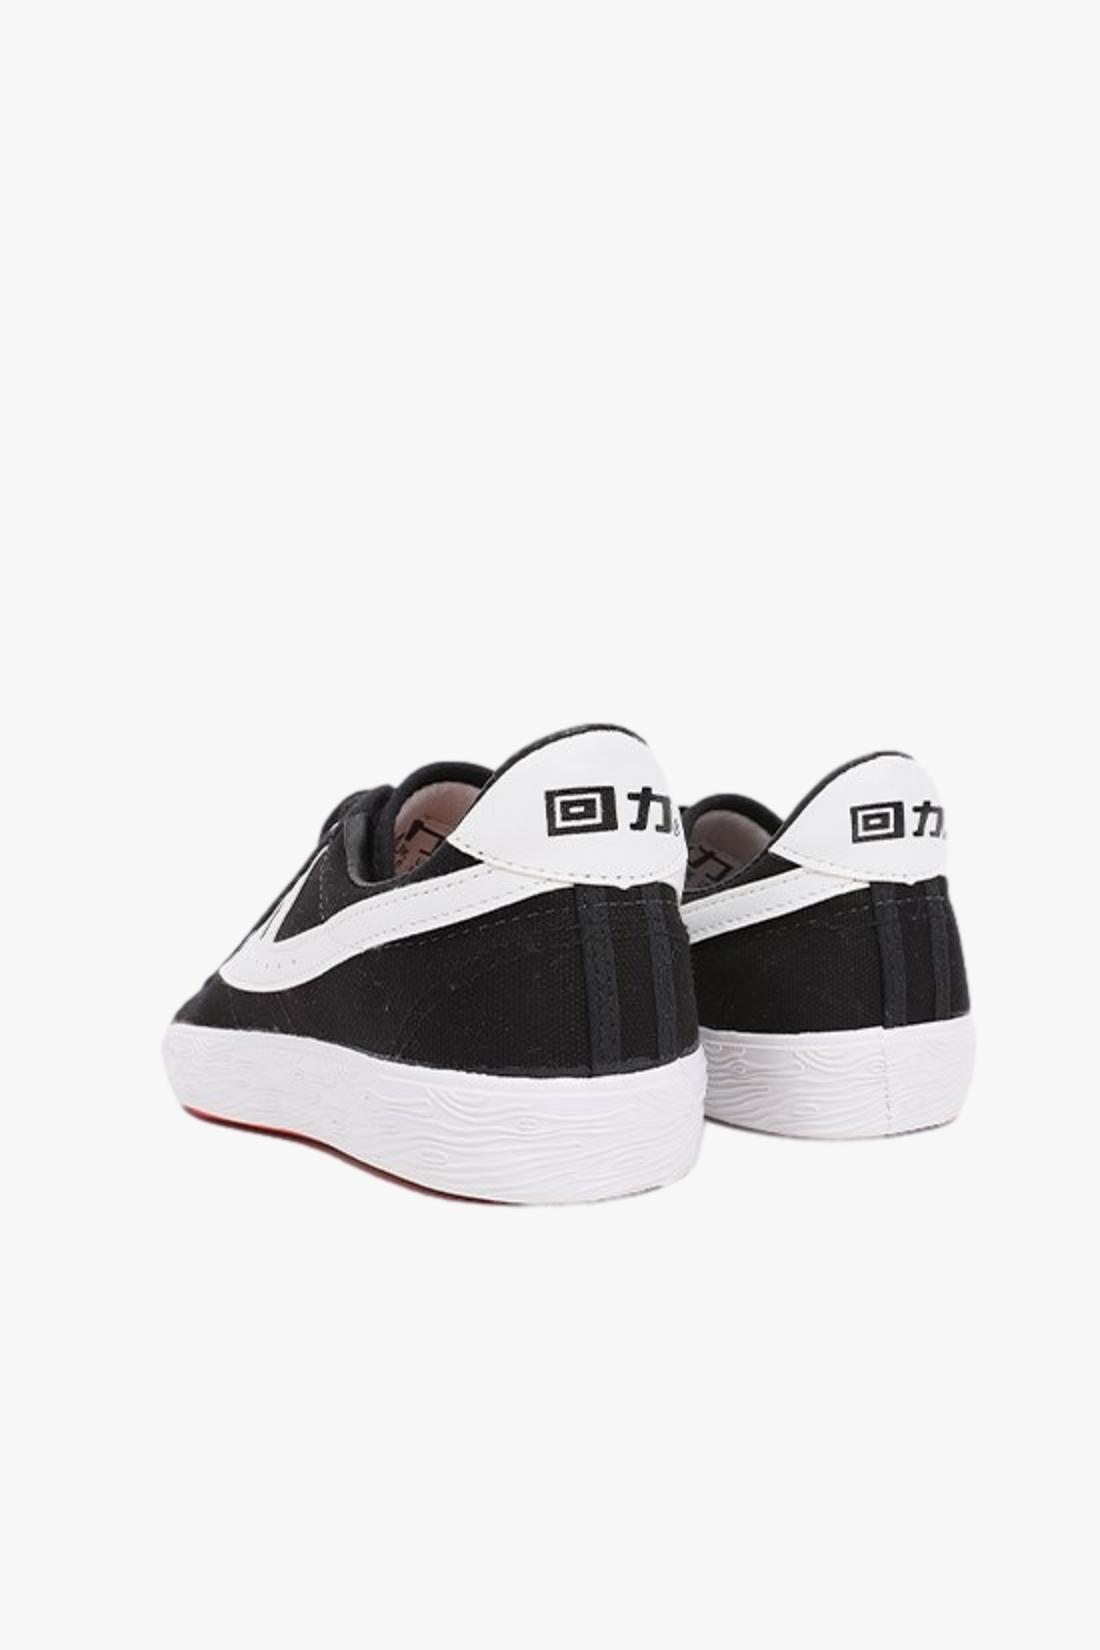 WARRIOR SHANGAI / Wb-1 Black white